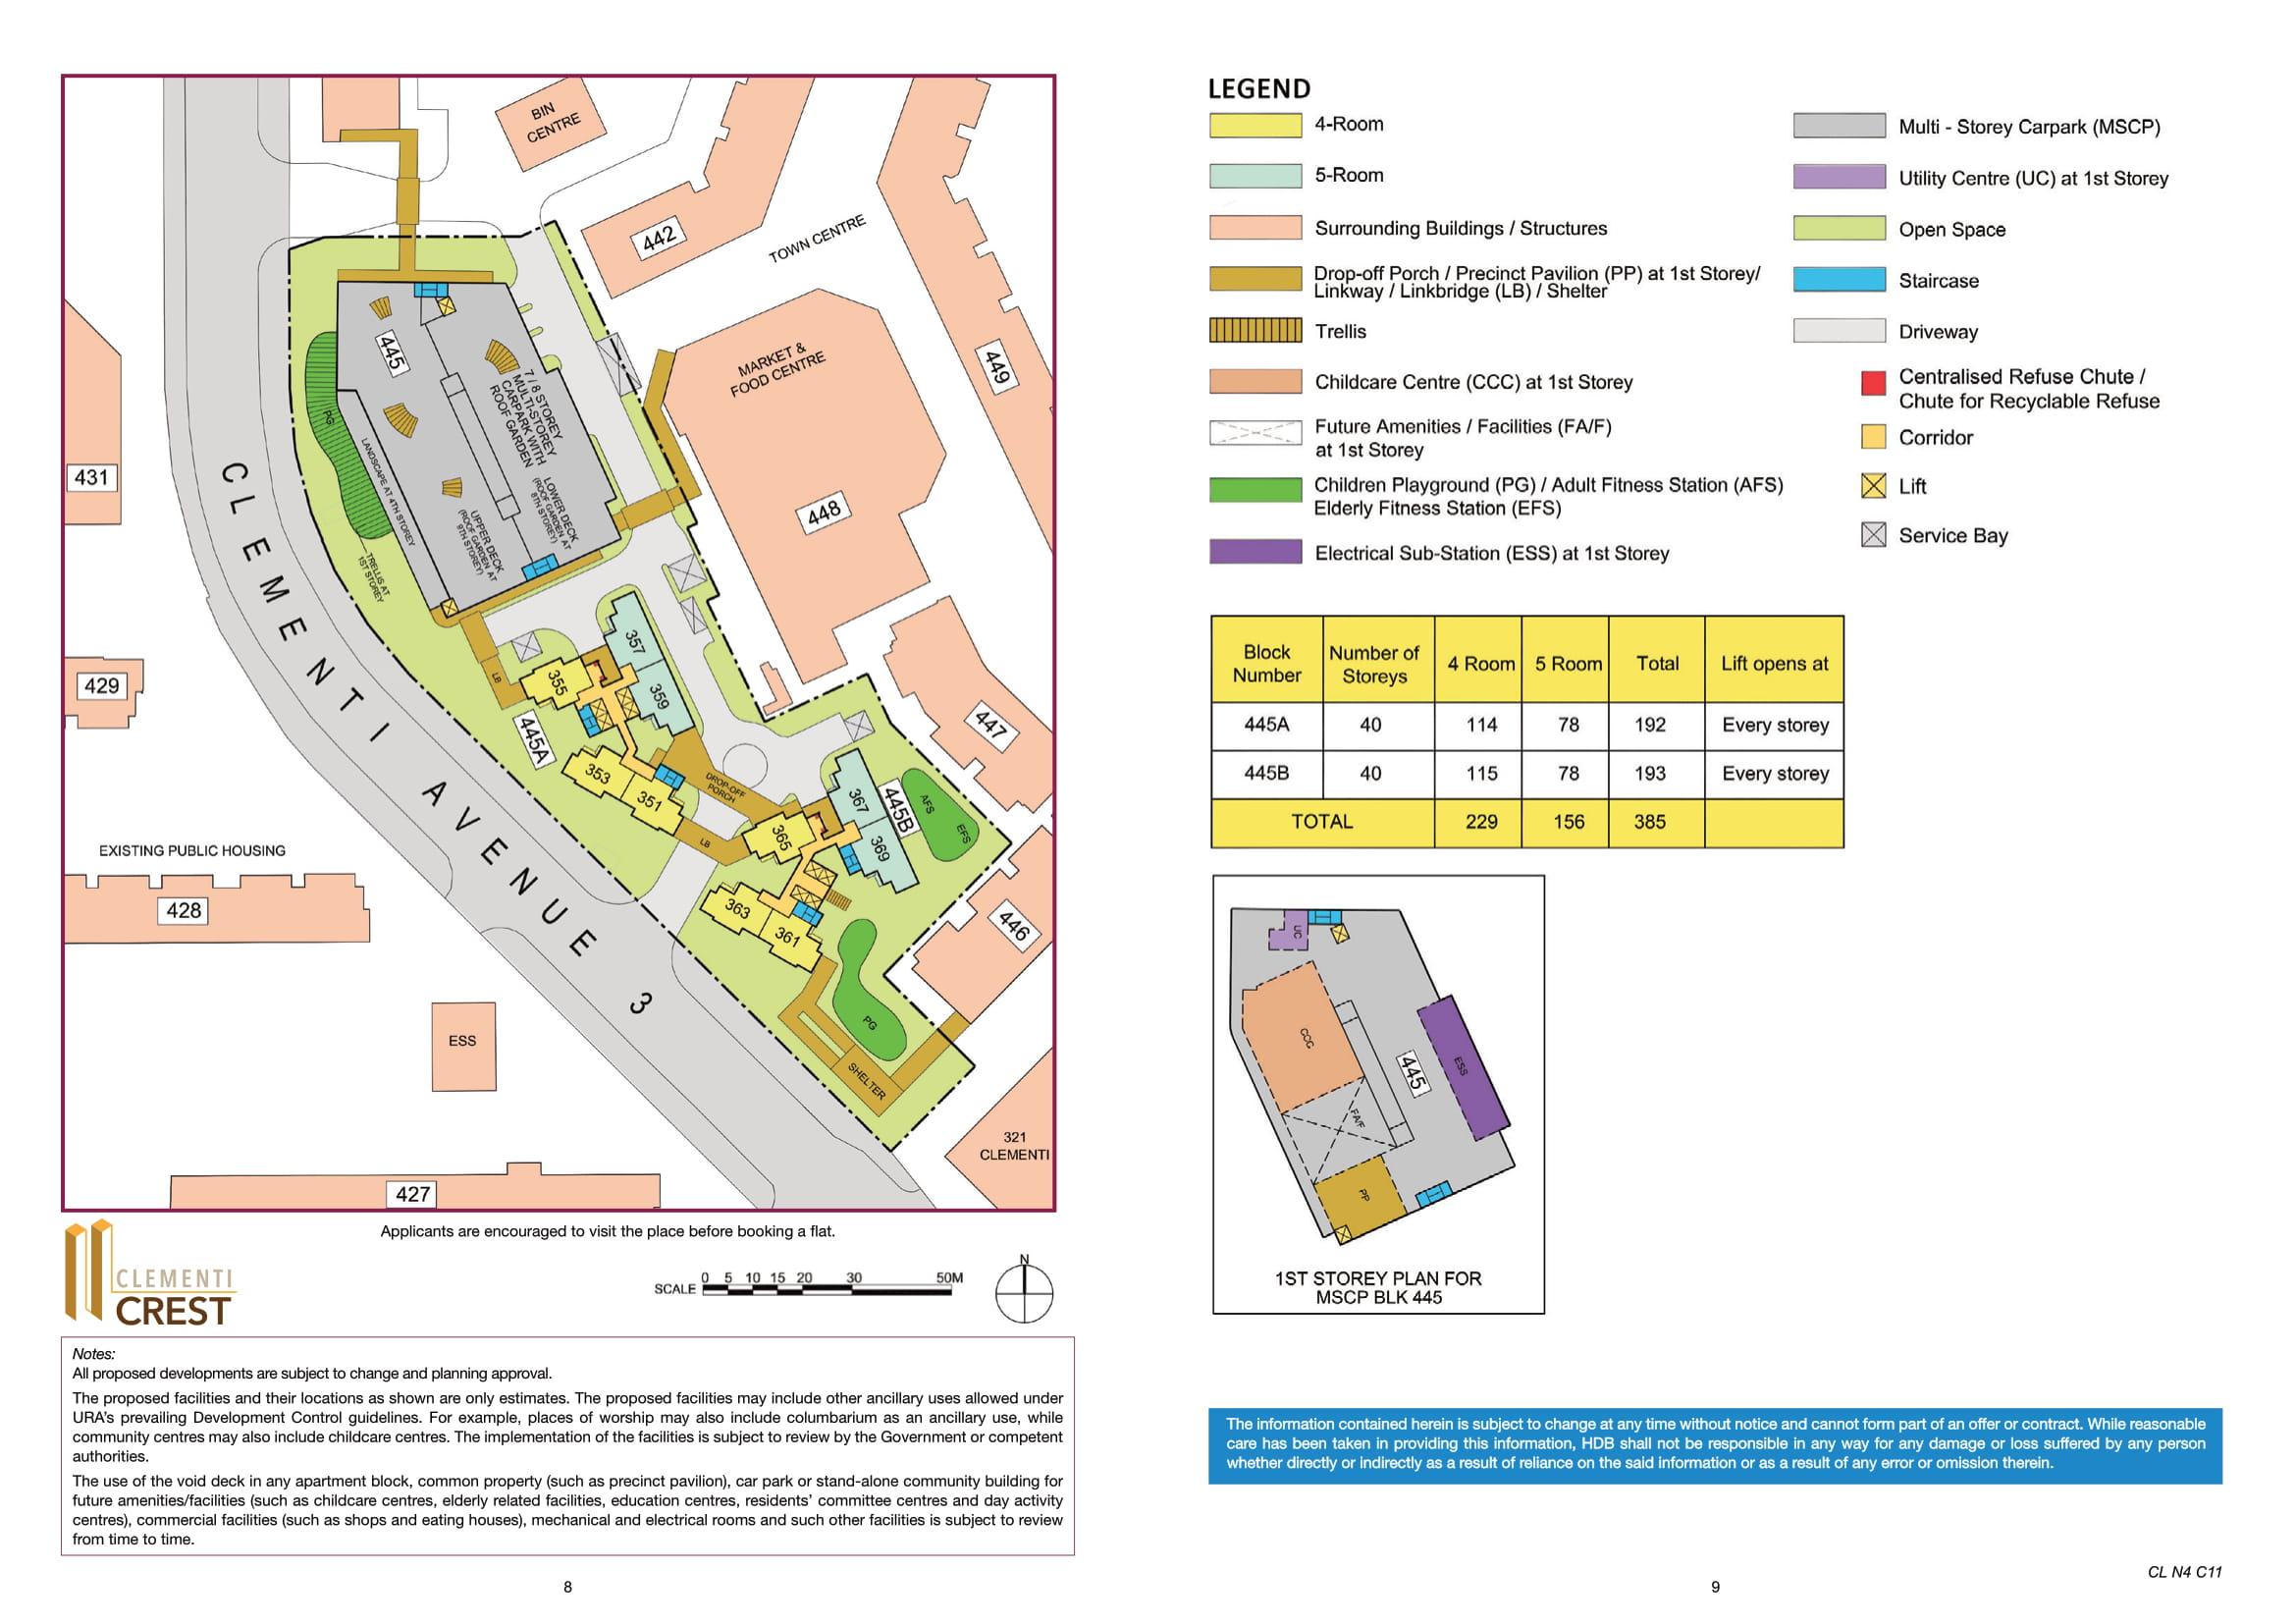 Clementi Crest Site Plan